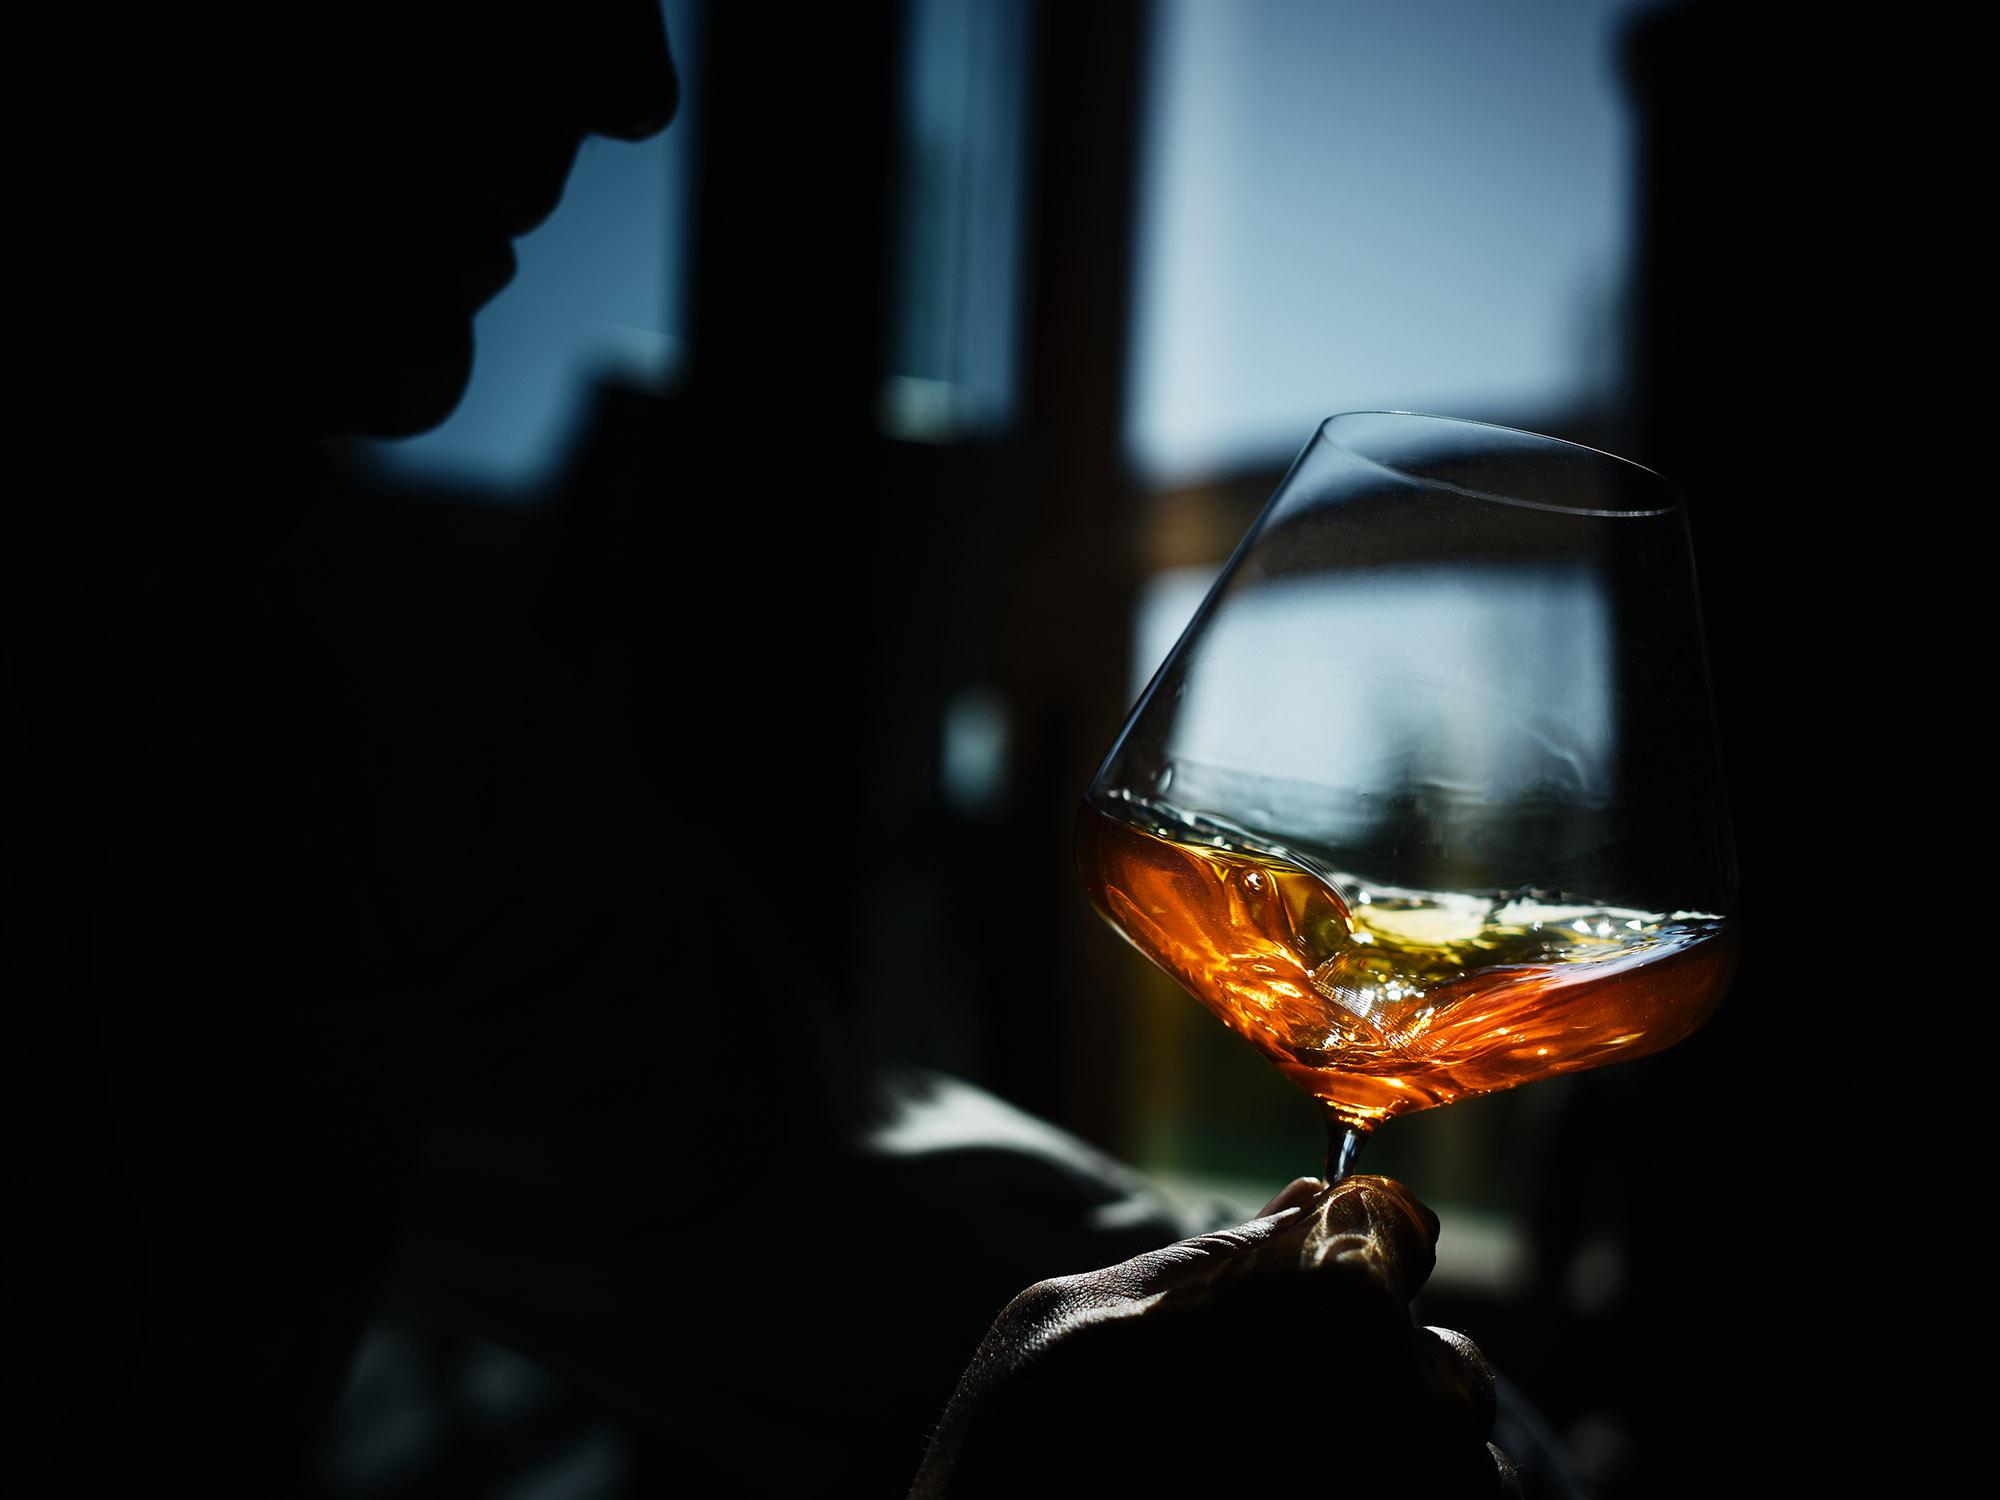 Wine from Štajerska with a soul from Primorska